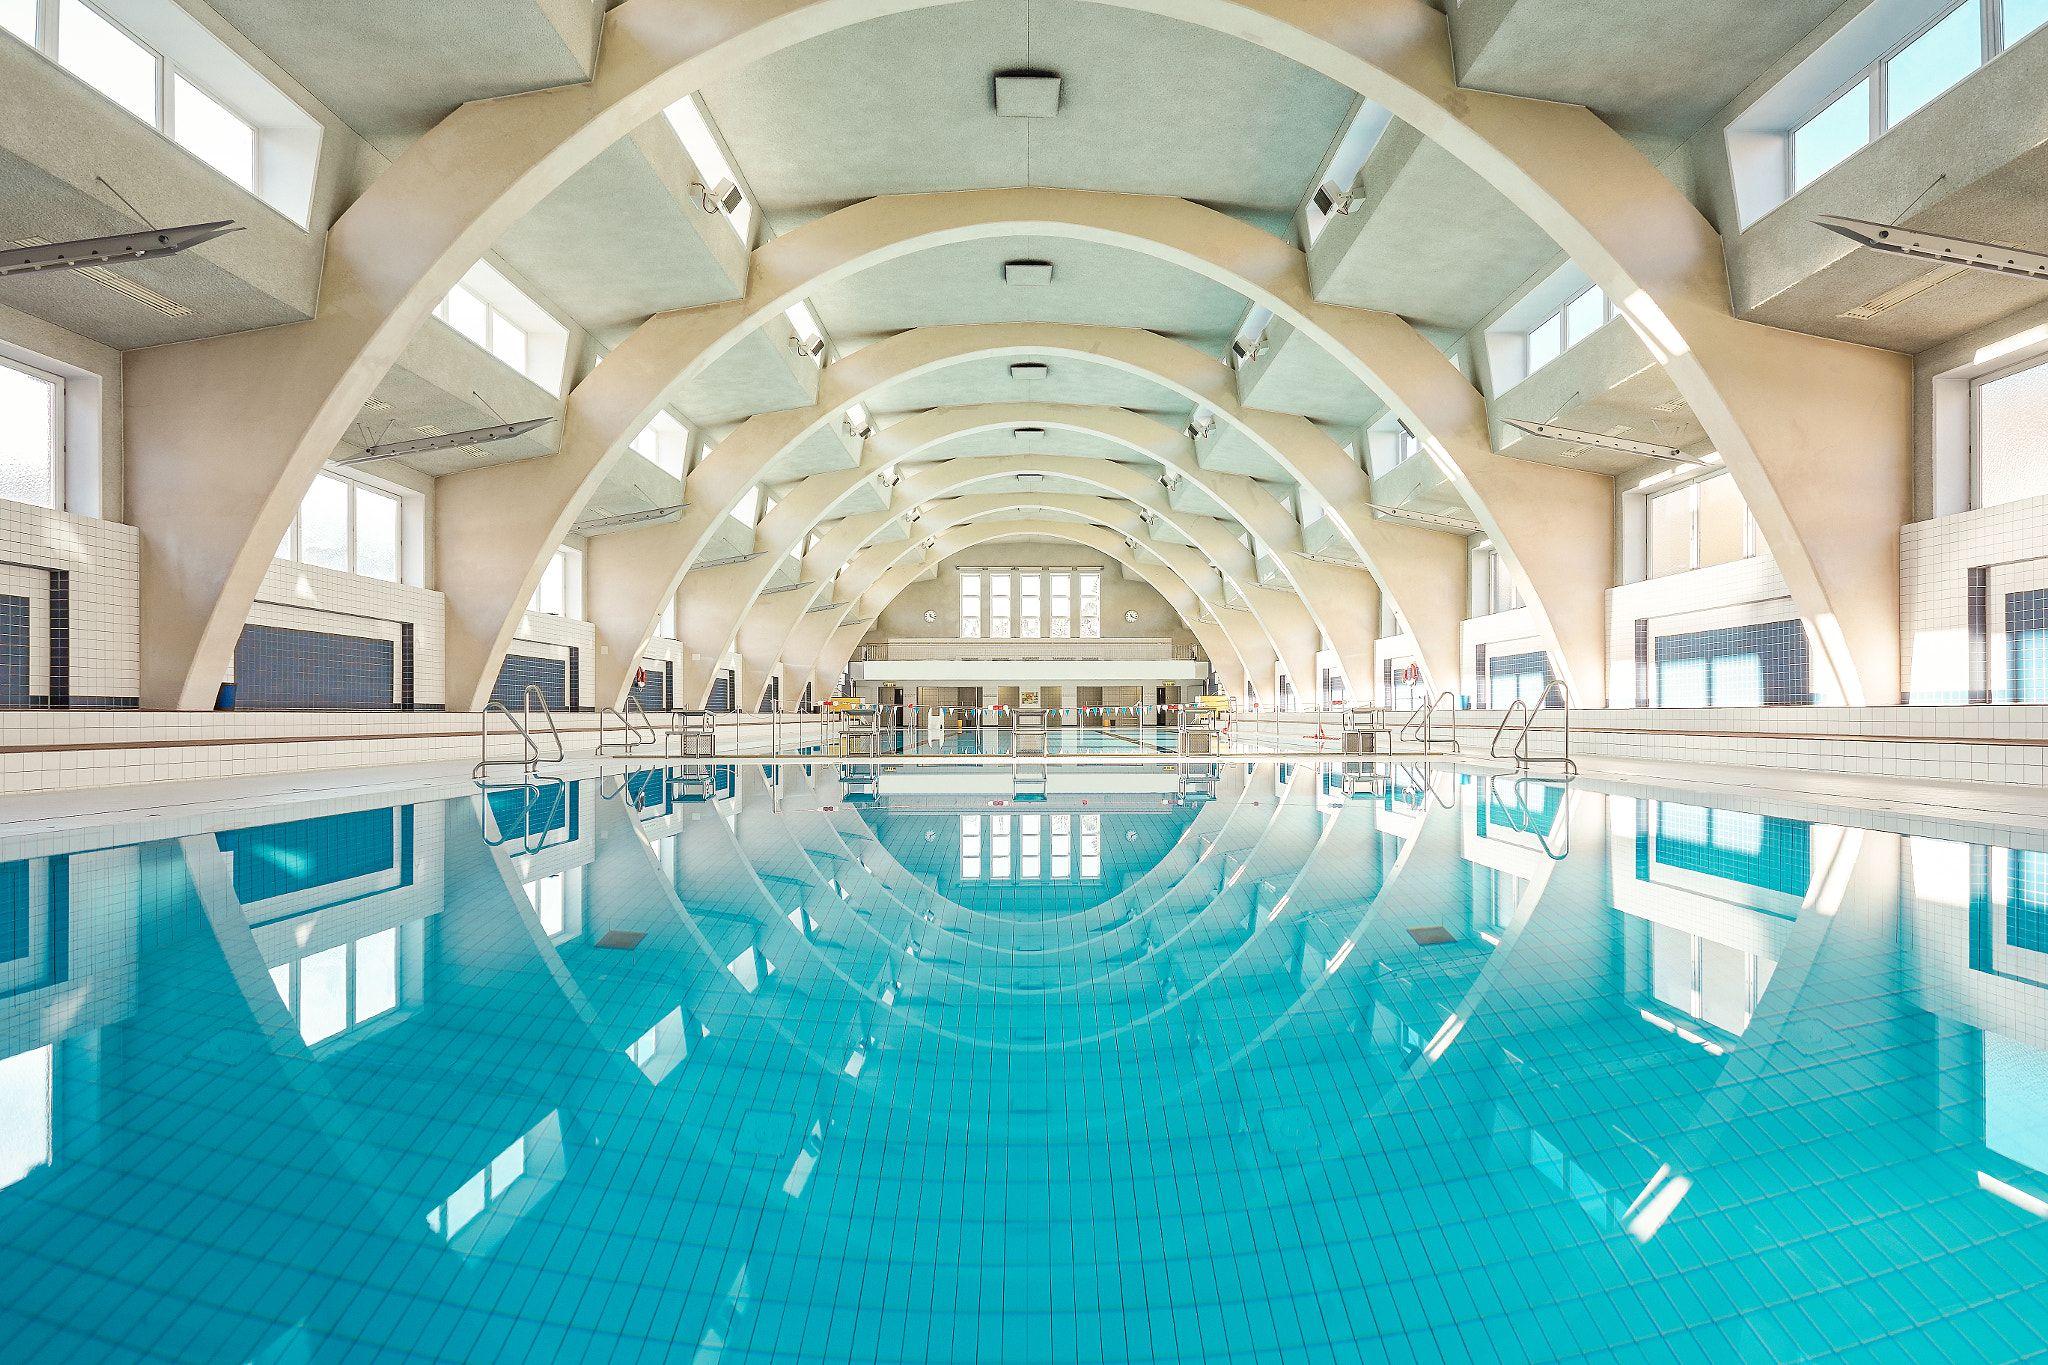 Public Swimming Pool   Beautiful Public Indoor Swimming Pool Captured In  Stuttgart, Germany